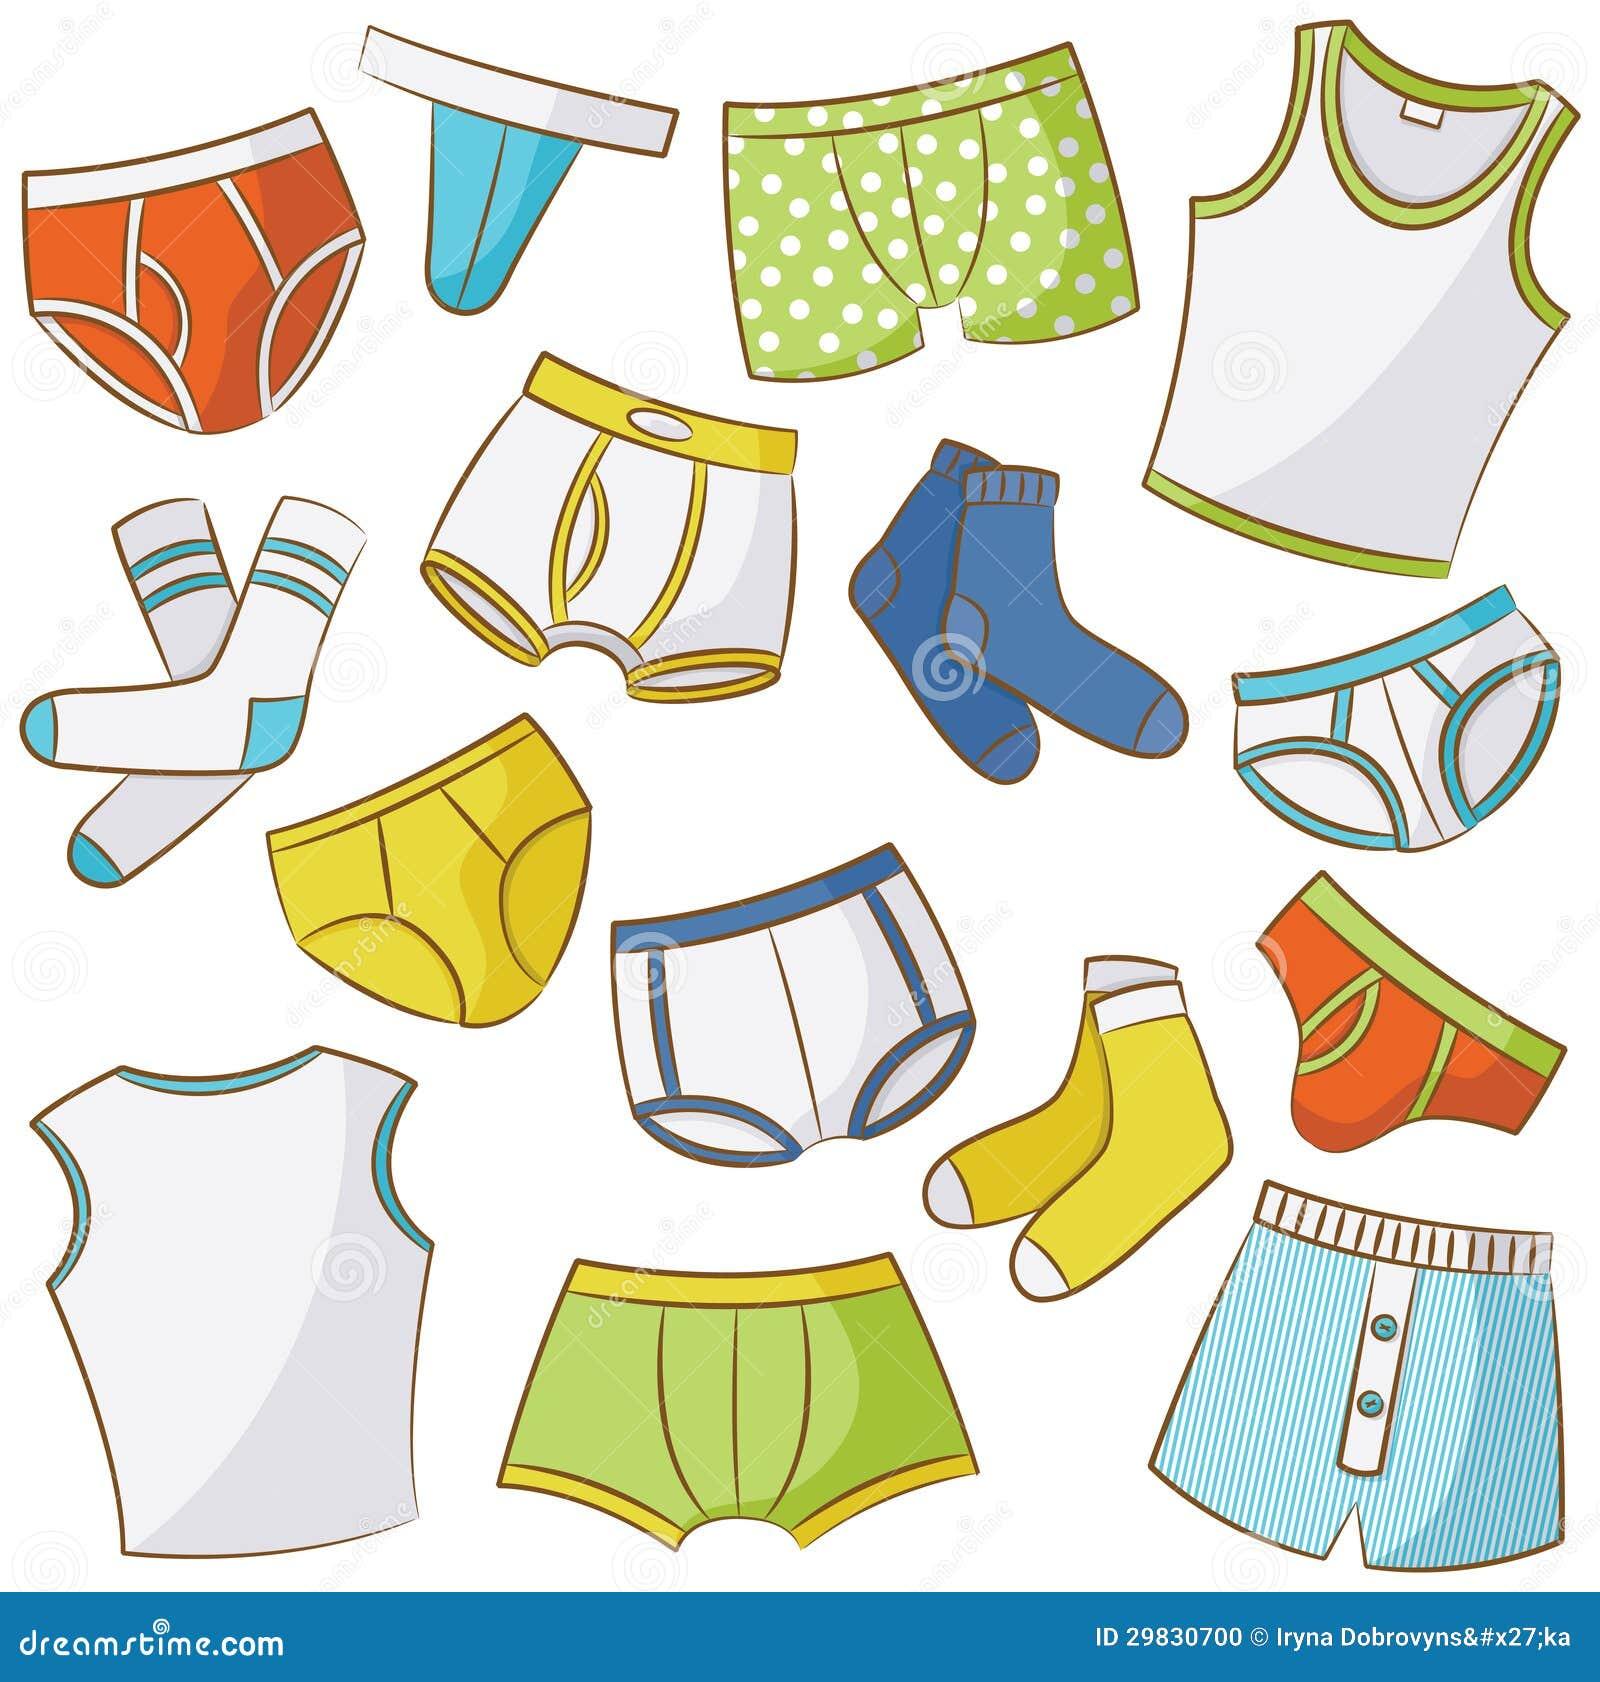 underwear clipart images - photo #22